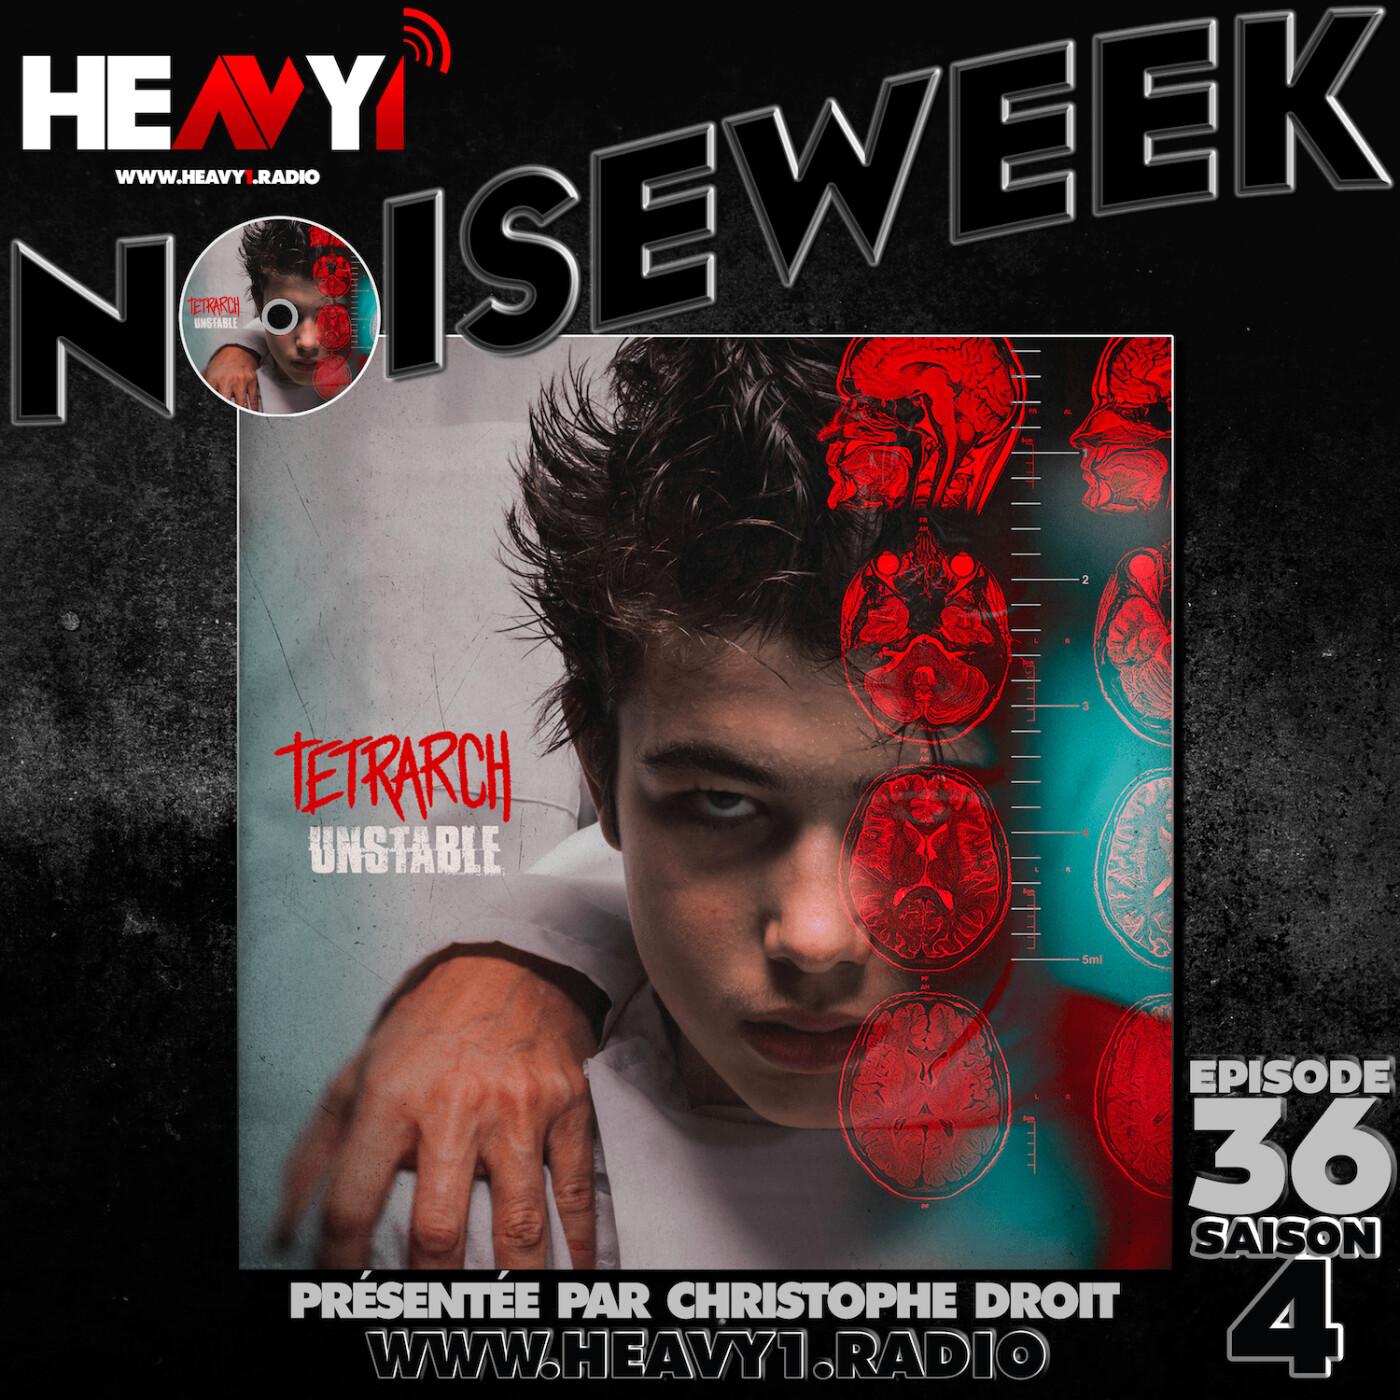 Noiseweek #36 Saison 4